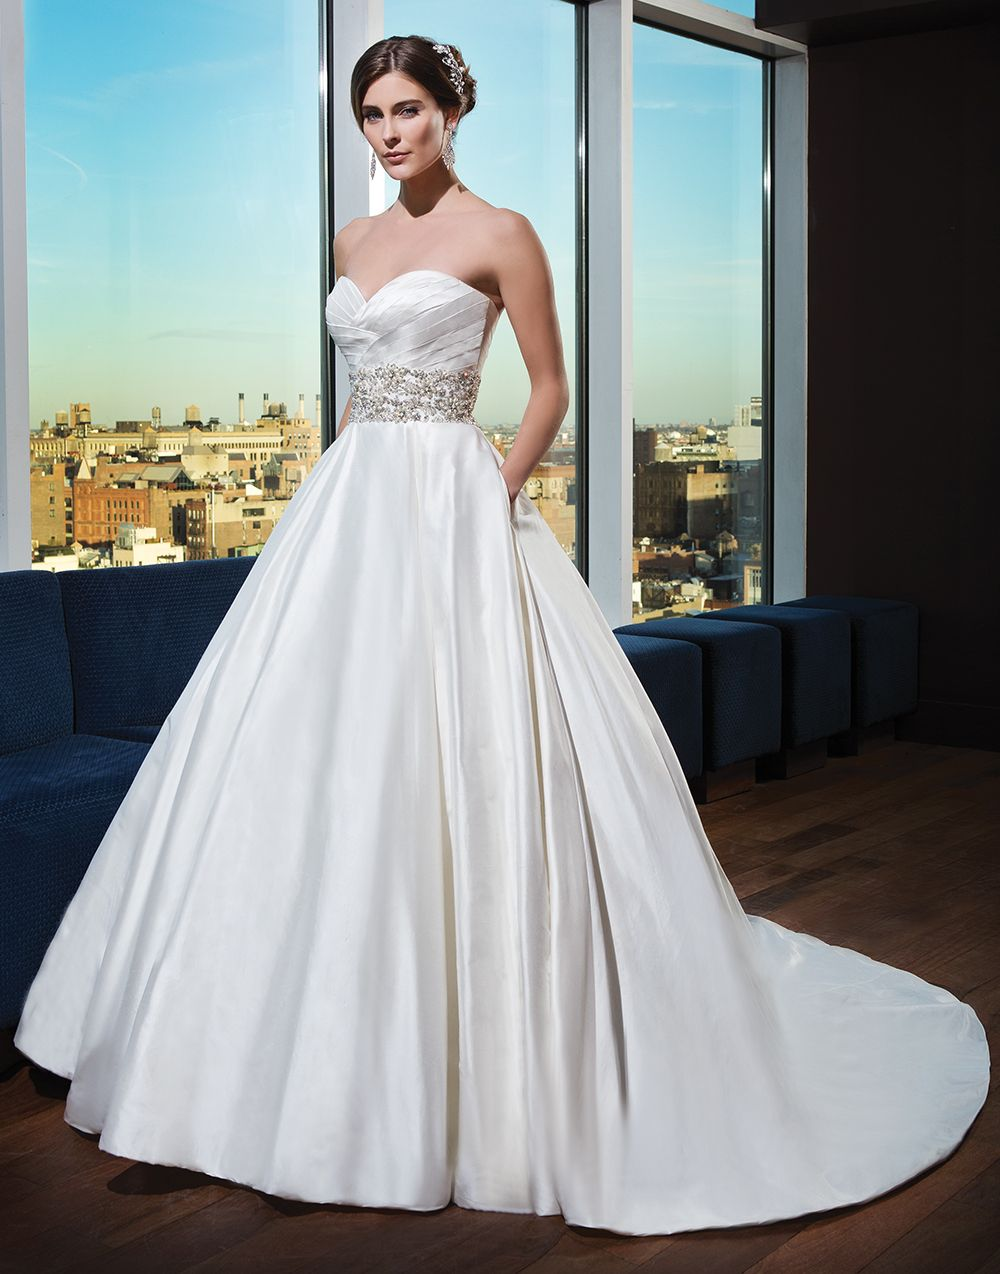 Justin Alexander signature wedding dresses style 9752 Silk